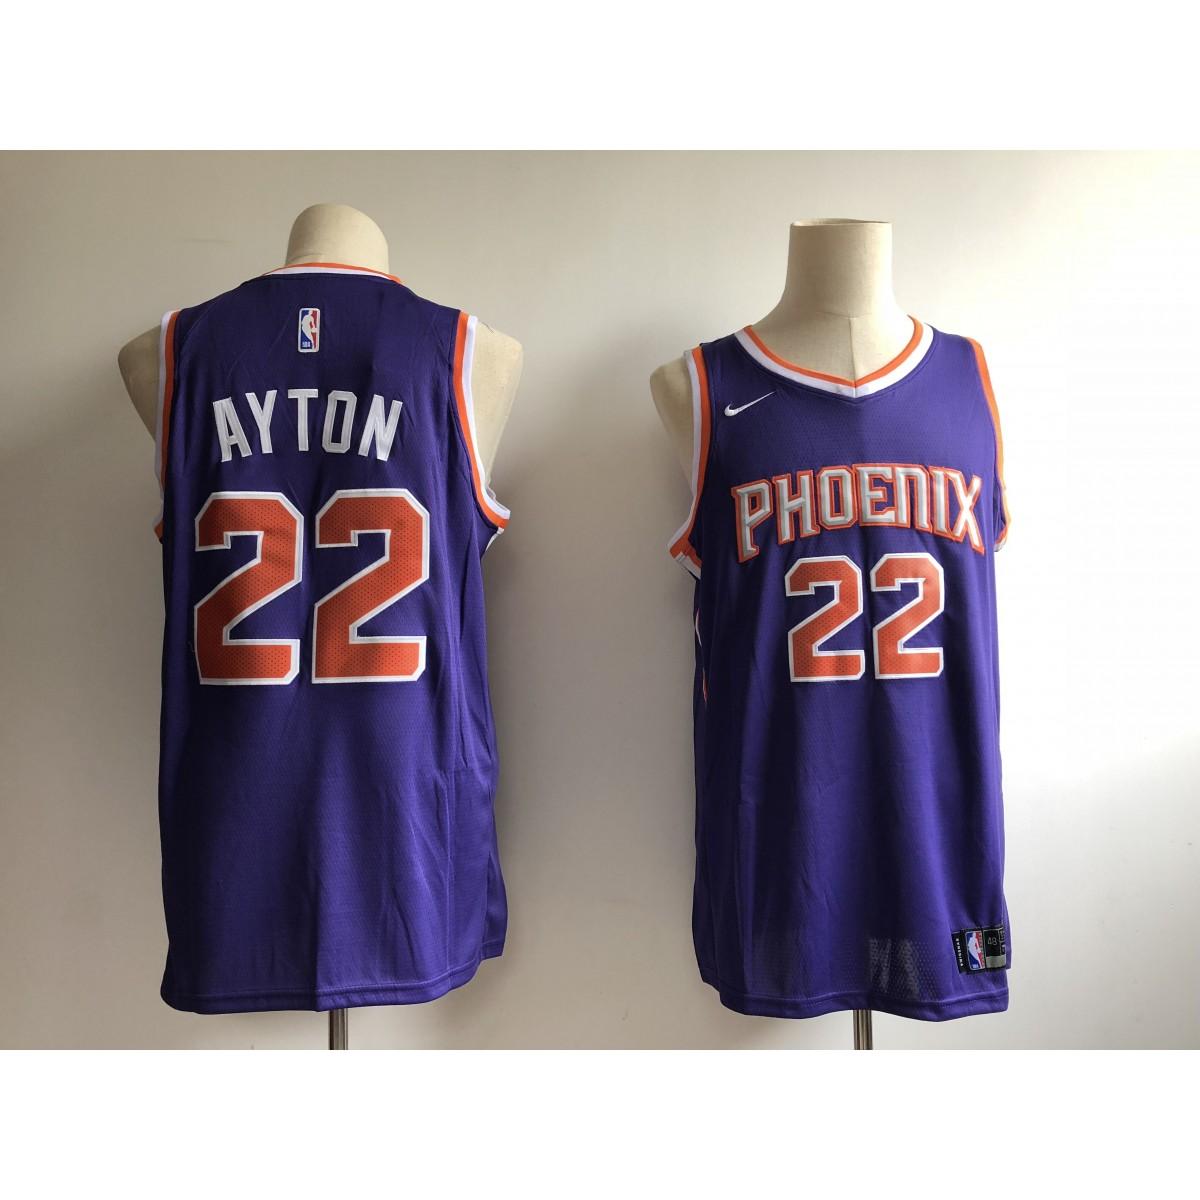 the best attitude 8192c 09285 NBA Suns 22 Deandre Ayton Purple 2018 NBA Draft Nike Men Jersey